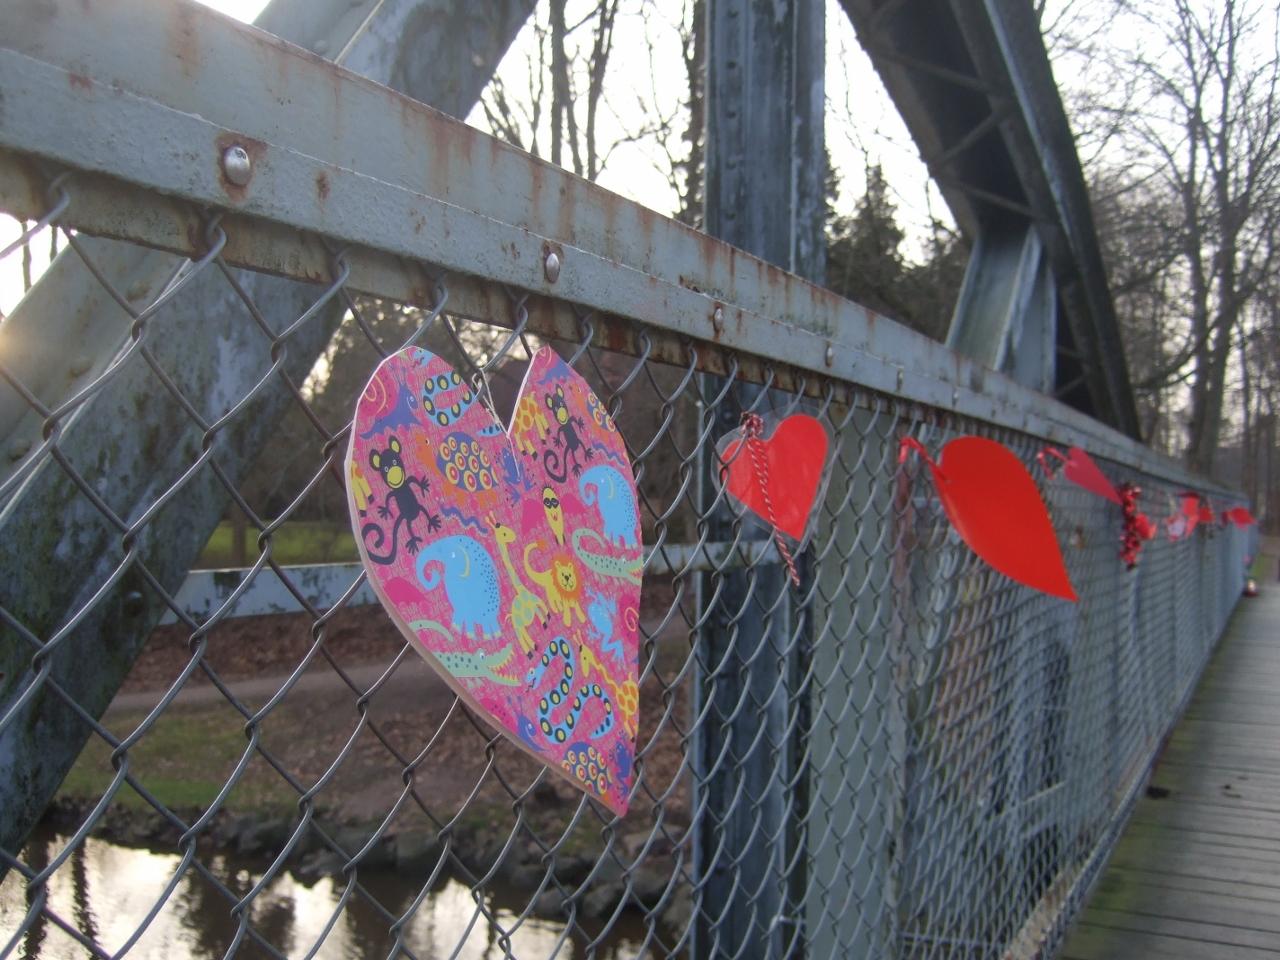 2014-02-14 Alla hjärtans dag Pyttebron 024 (1280x960)